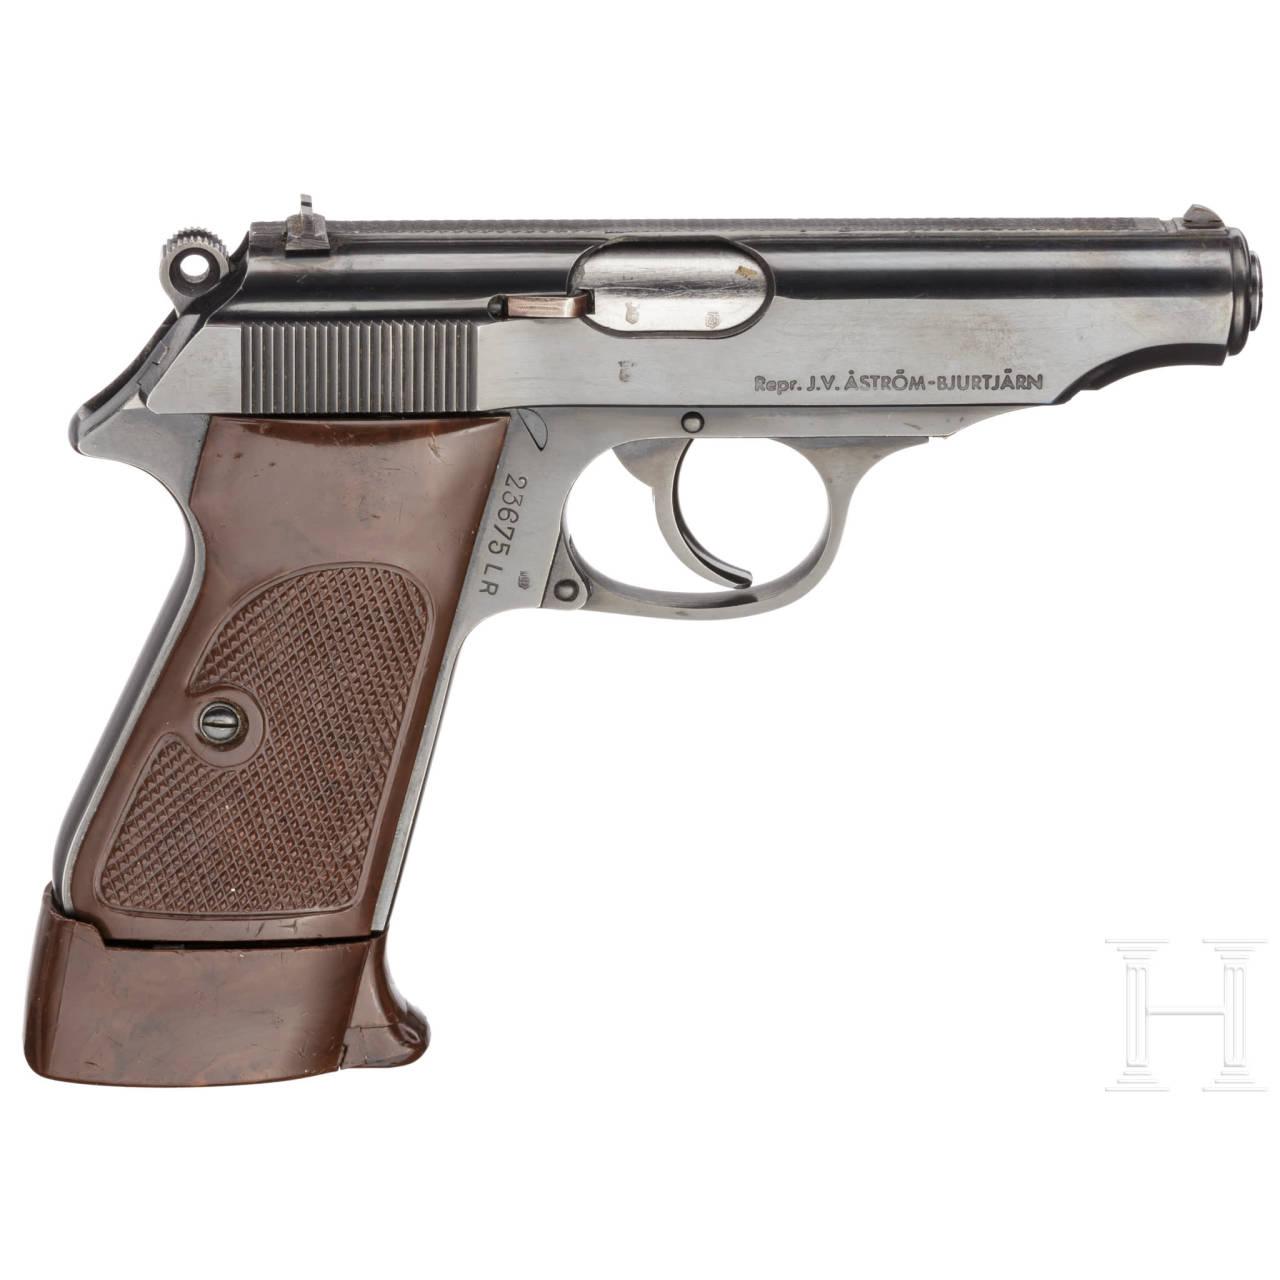 Walther-Manurhin PP, Polizei, Ordonnanz